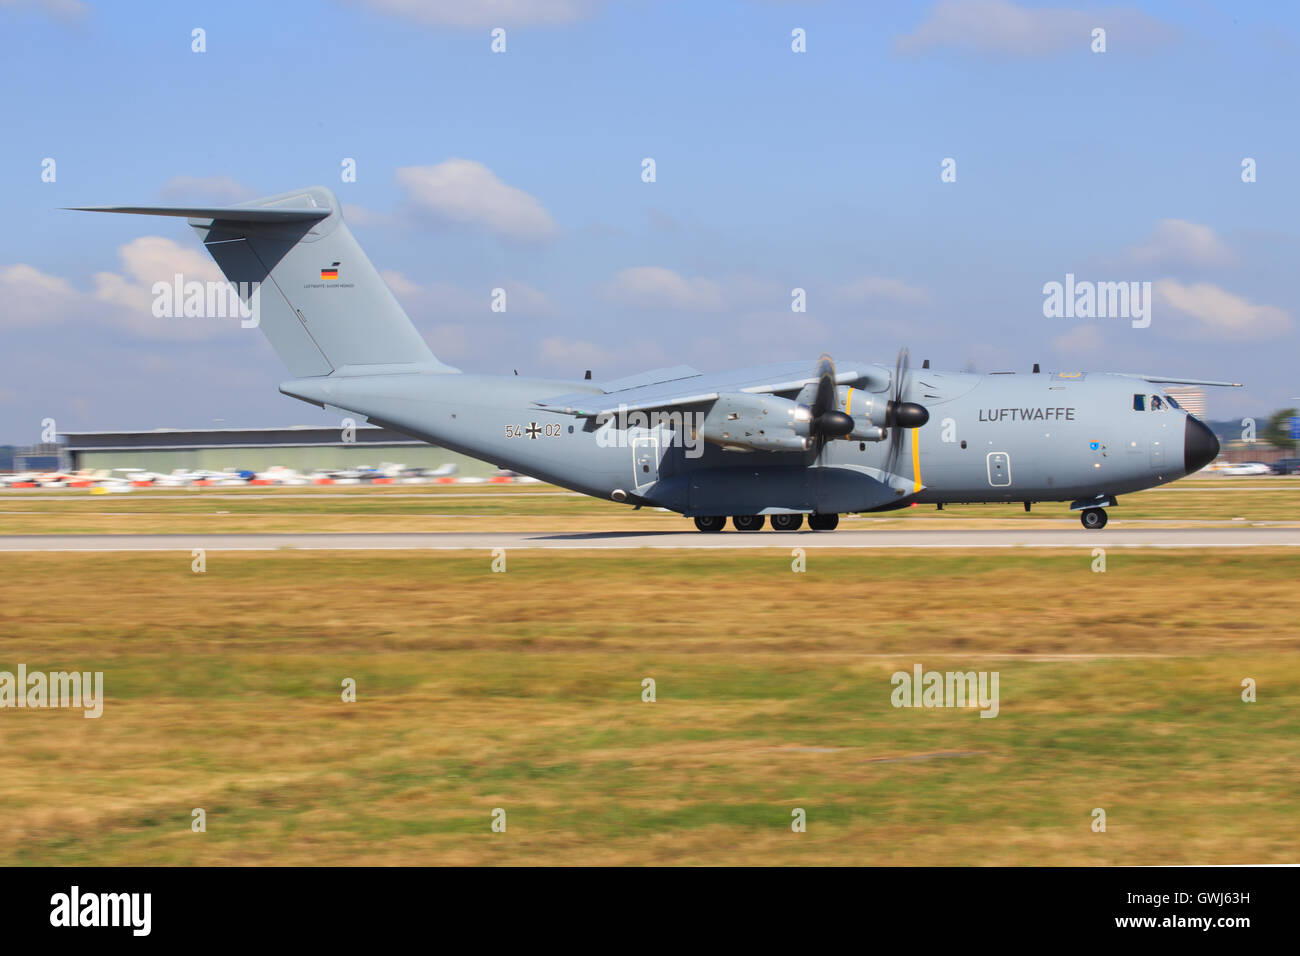 Airbus A400M from GAF landing at Stuttgart international airport. - Stock Image